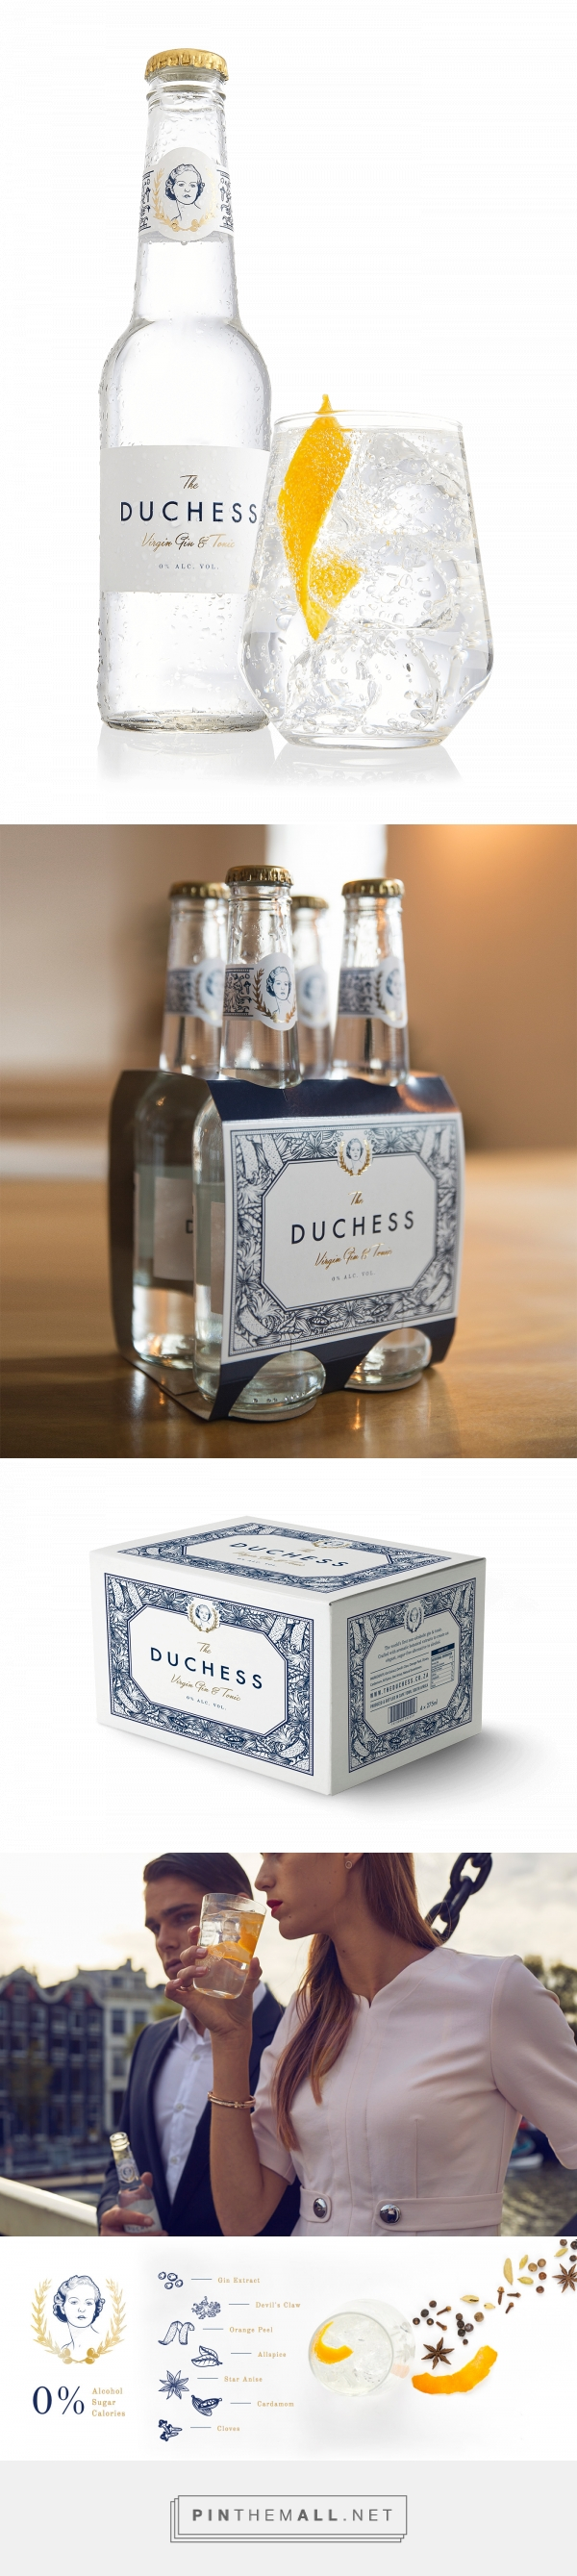 The Duchess Virgin Gin & Tonic Packaging by Fanakalo | Logo Designer ...